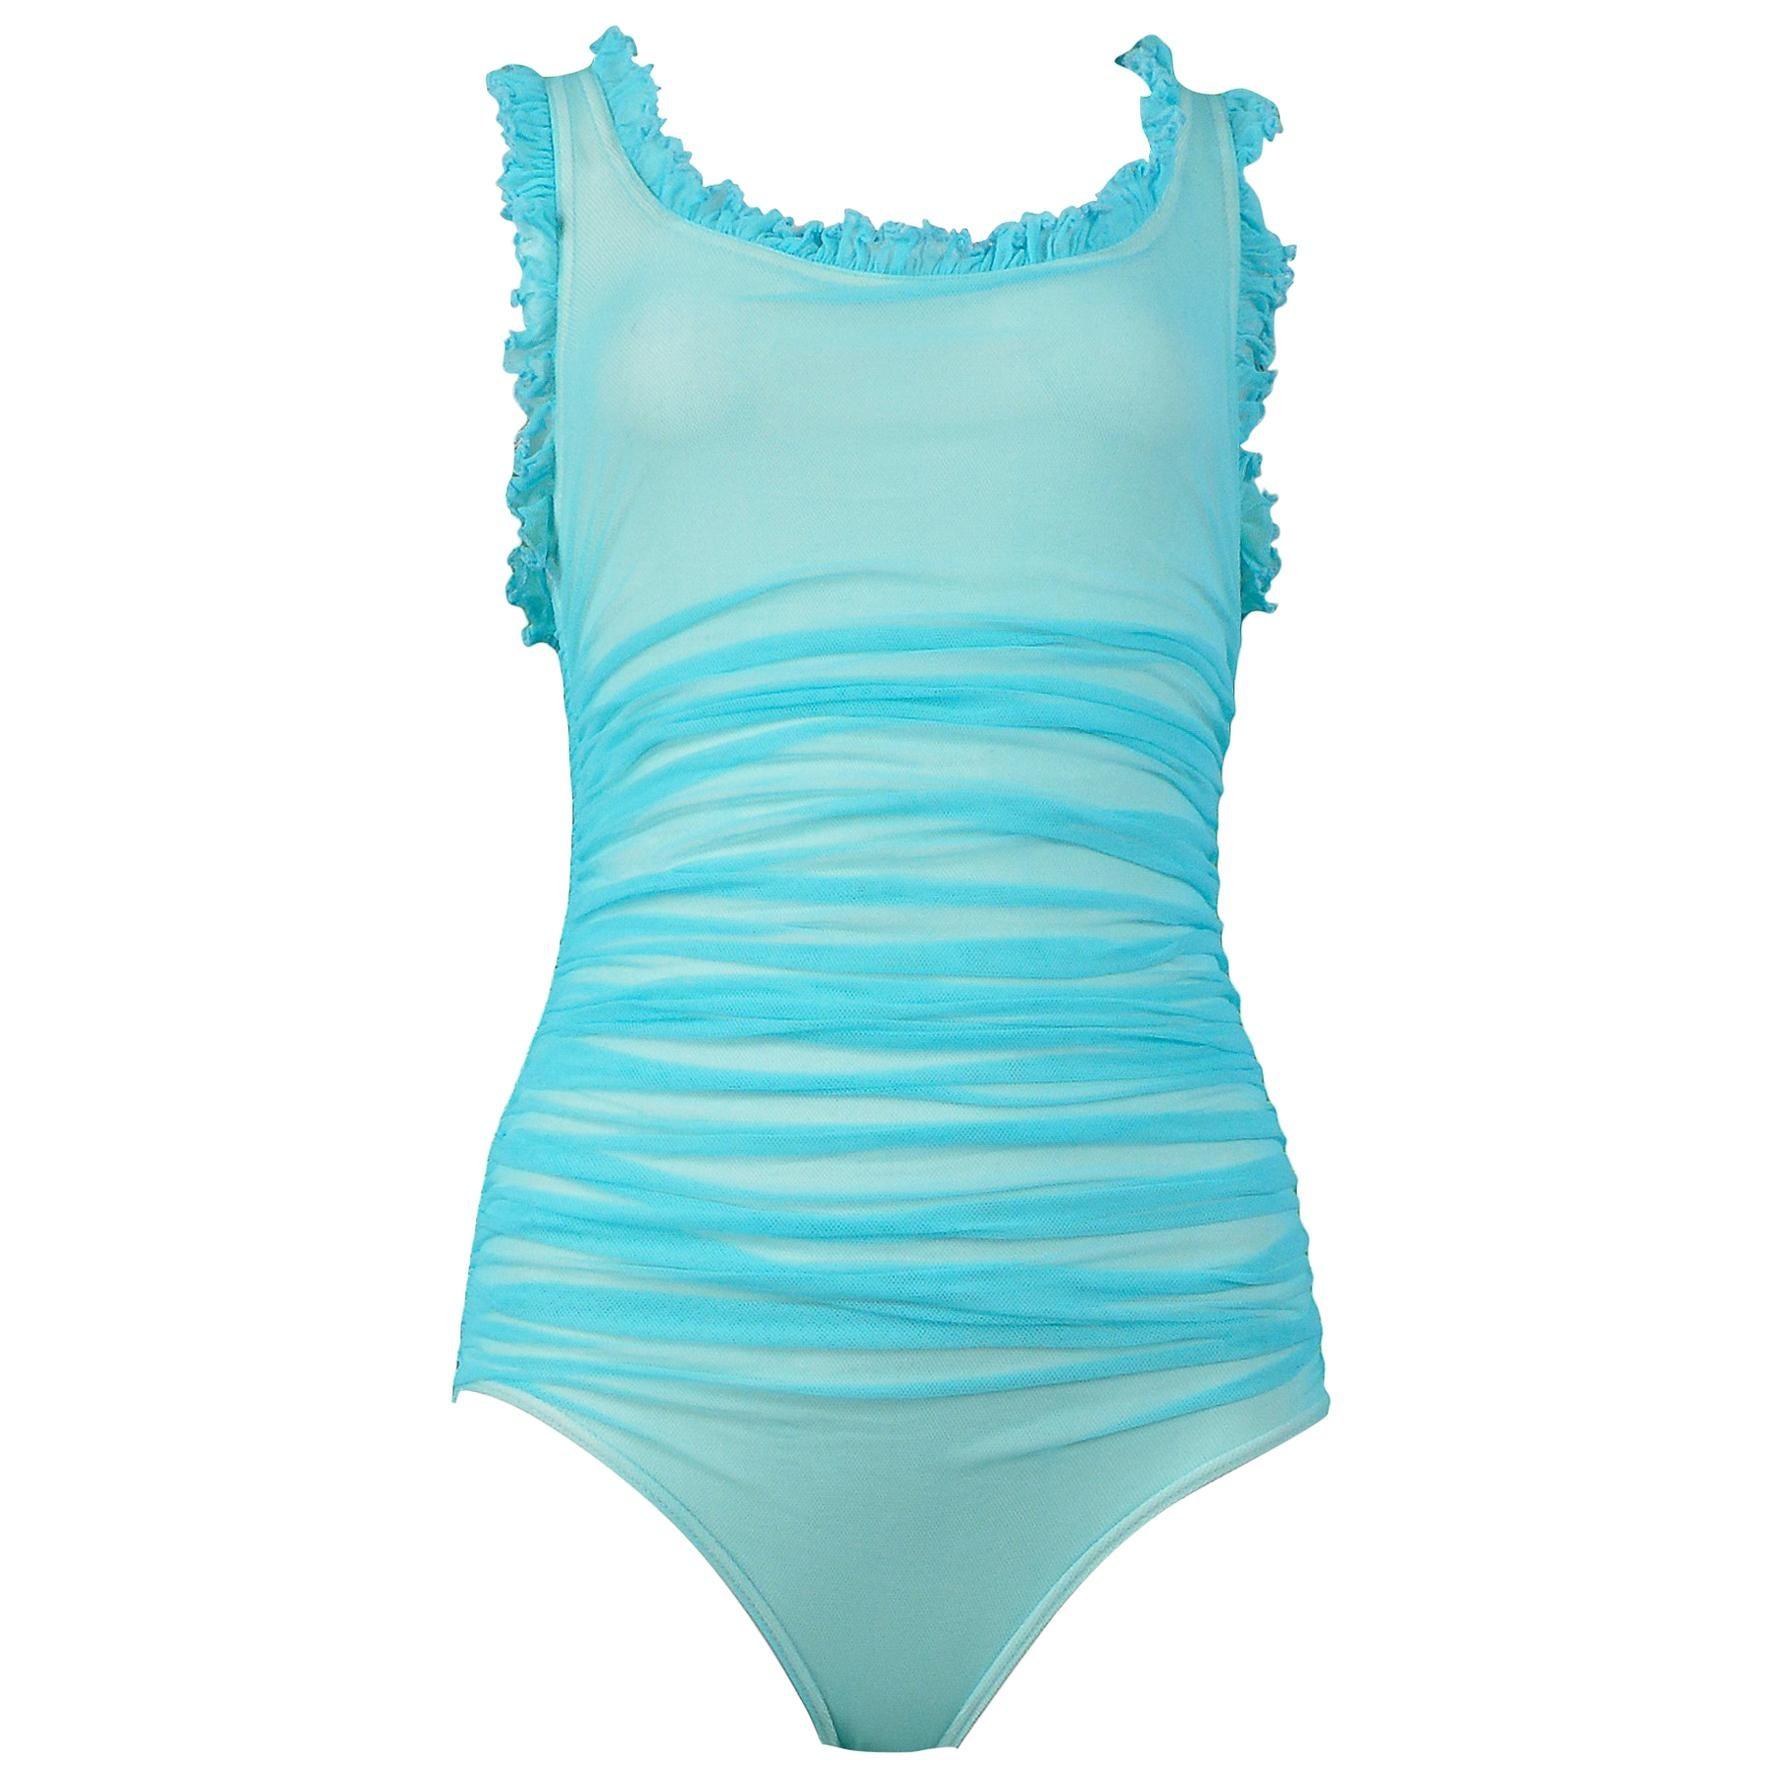 eb96c5ef5d Vintage and Designer Swimwear - 300 For Sale at 1stdibs